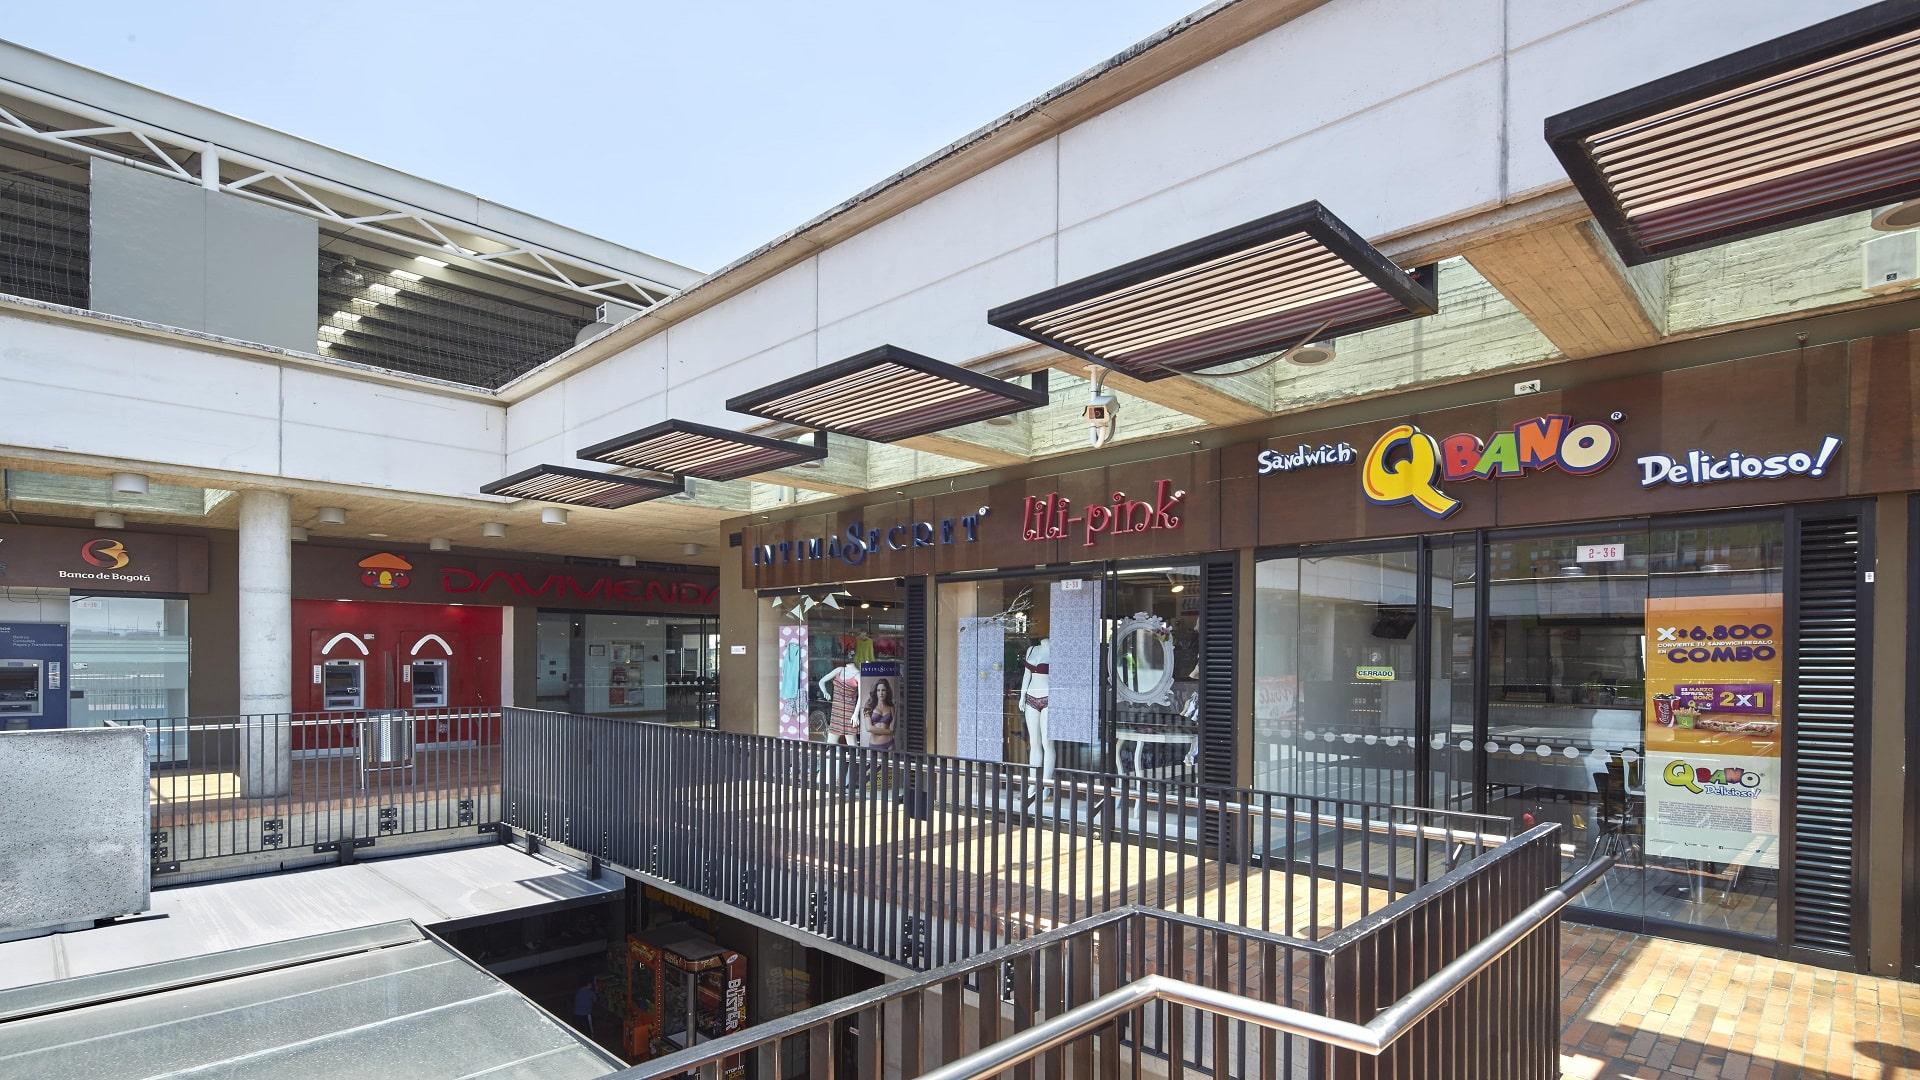 Bazaar Alsacia 2 piso Qbano- 1920X1080-min